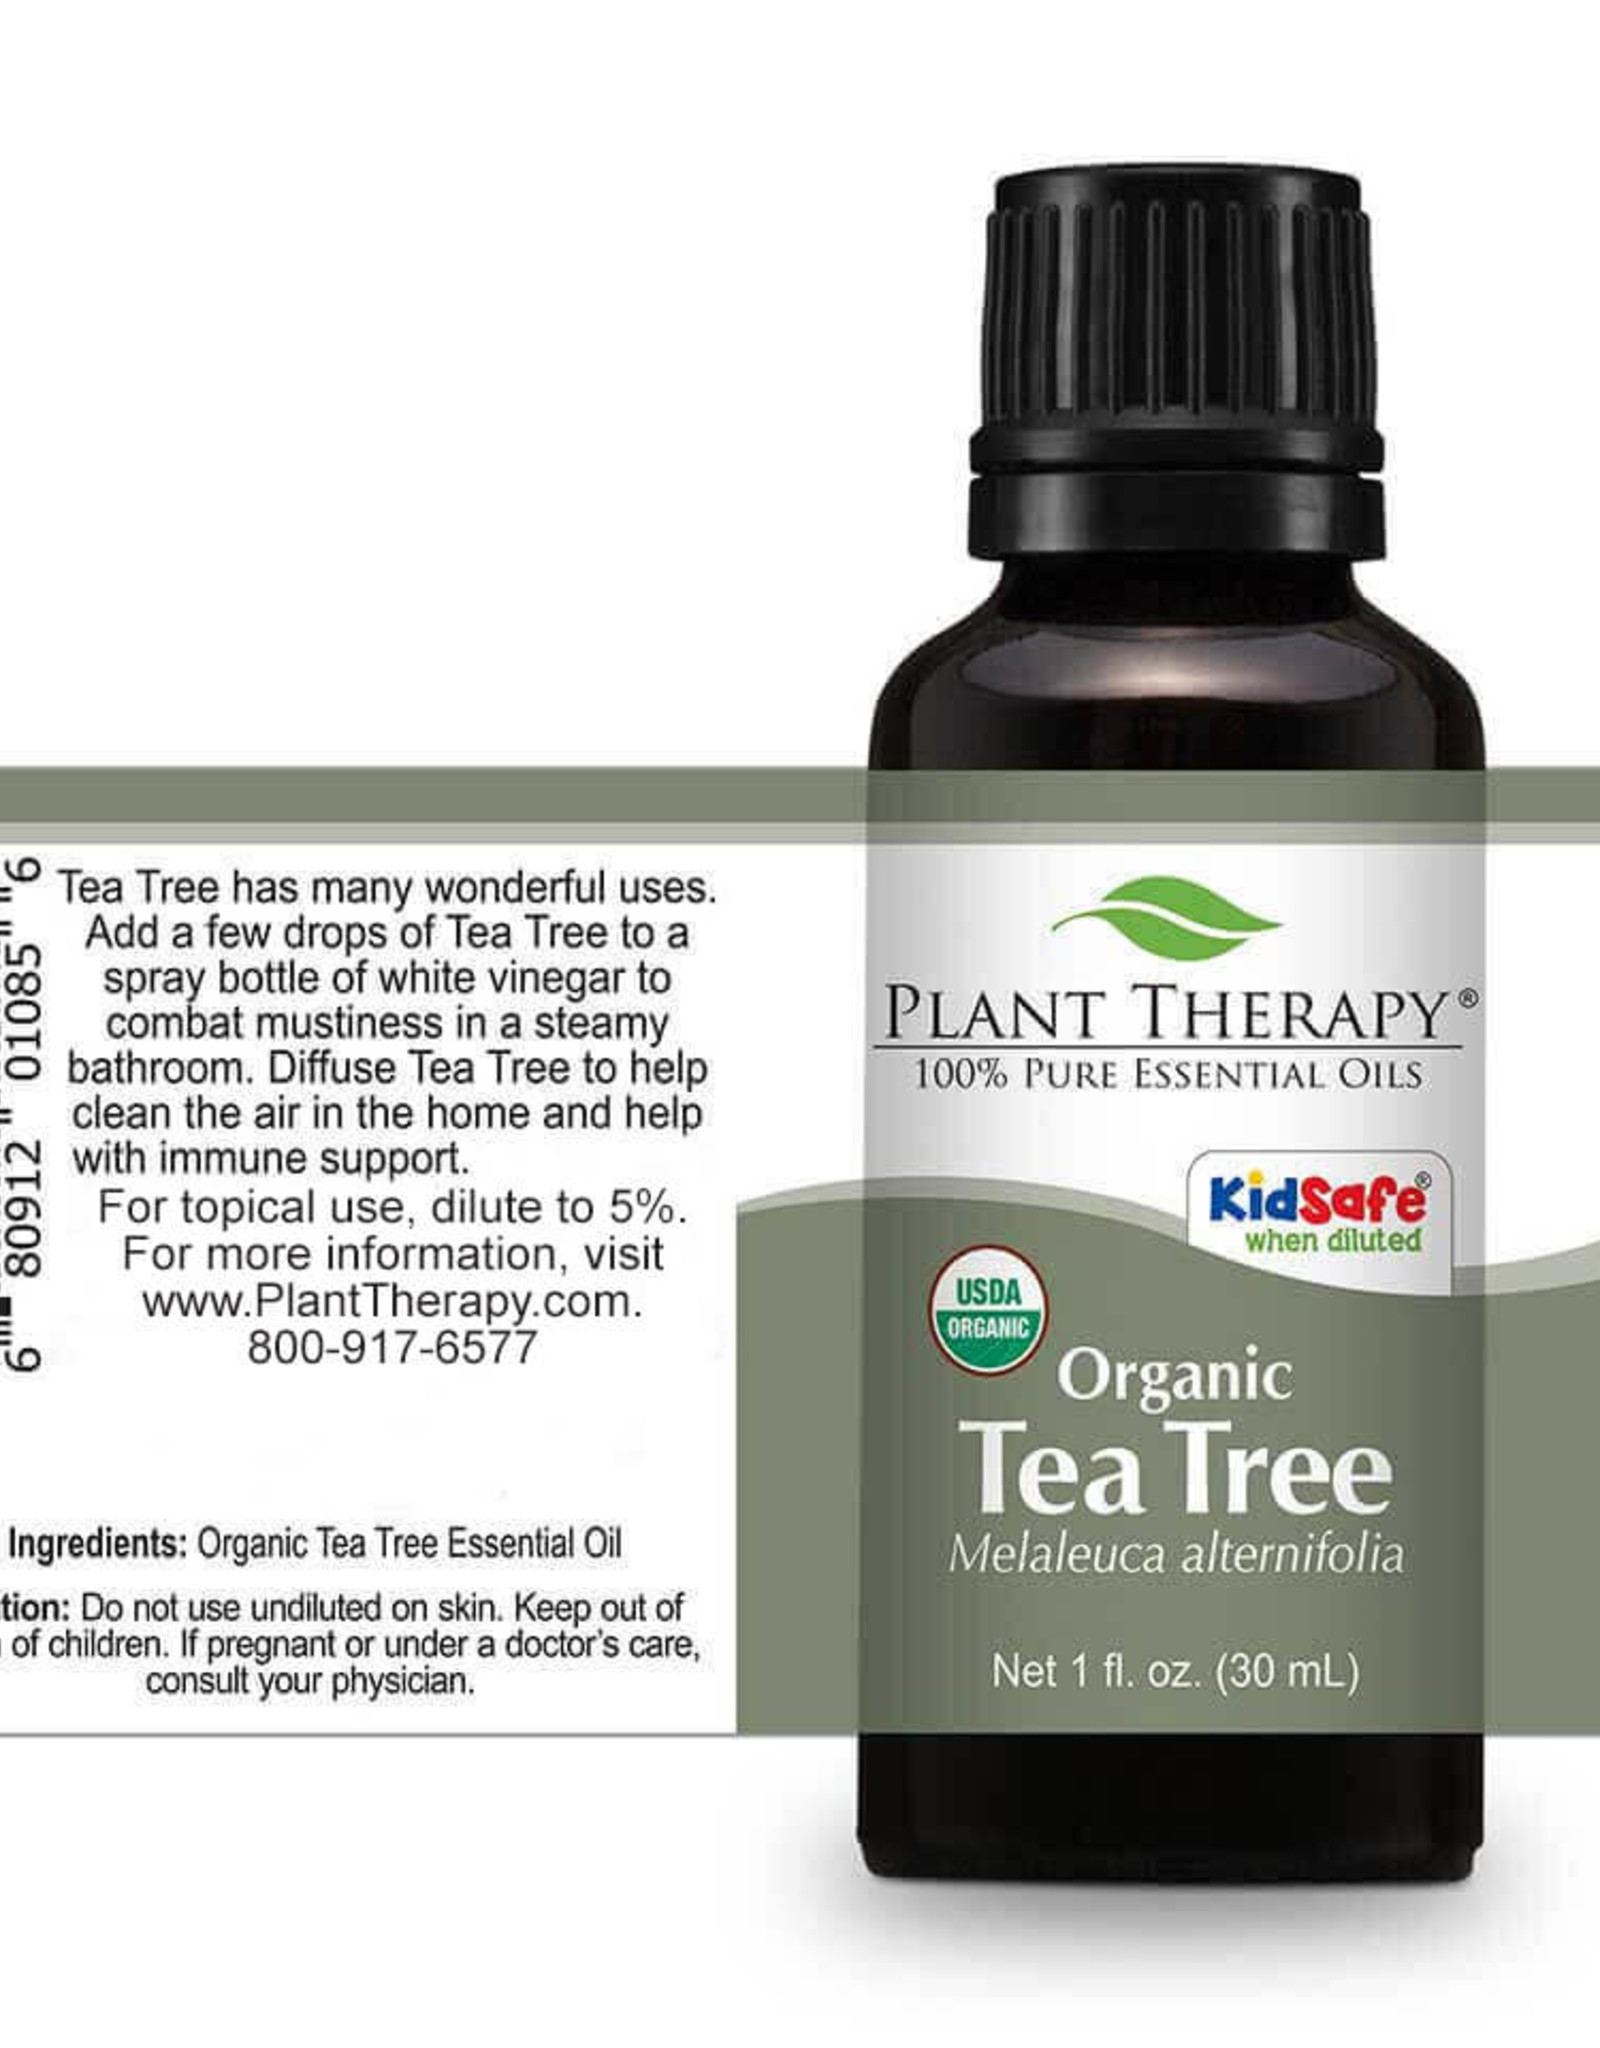 Plant Therapy Organic Tea Tree Essential Oil 30ml